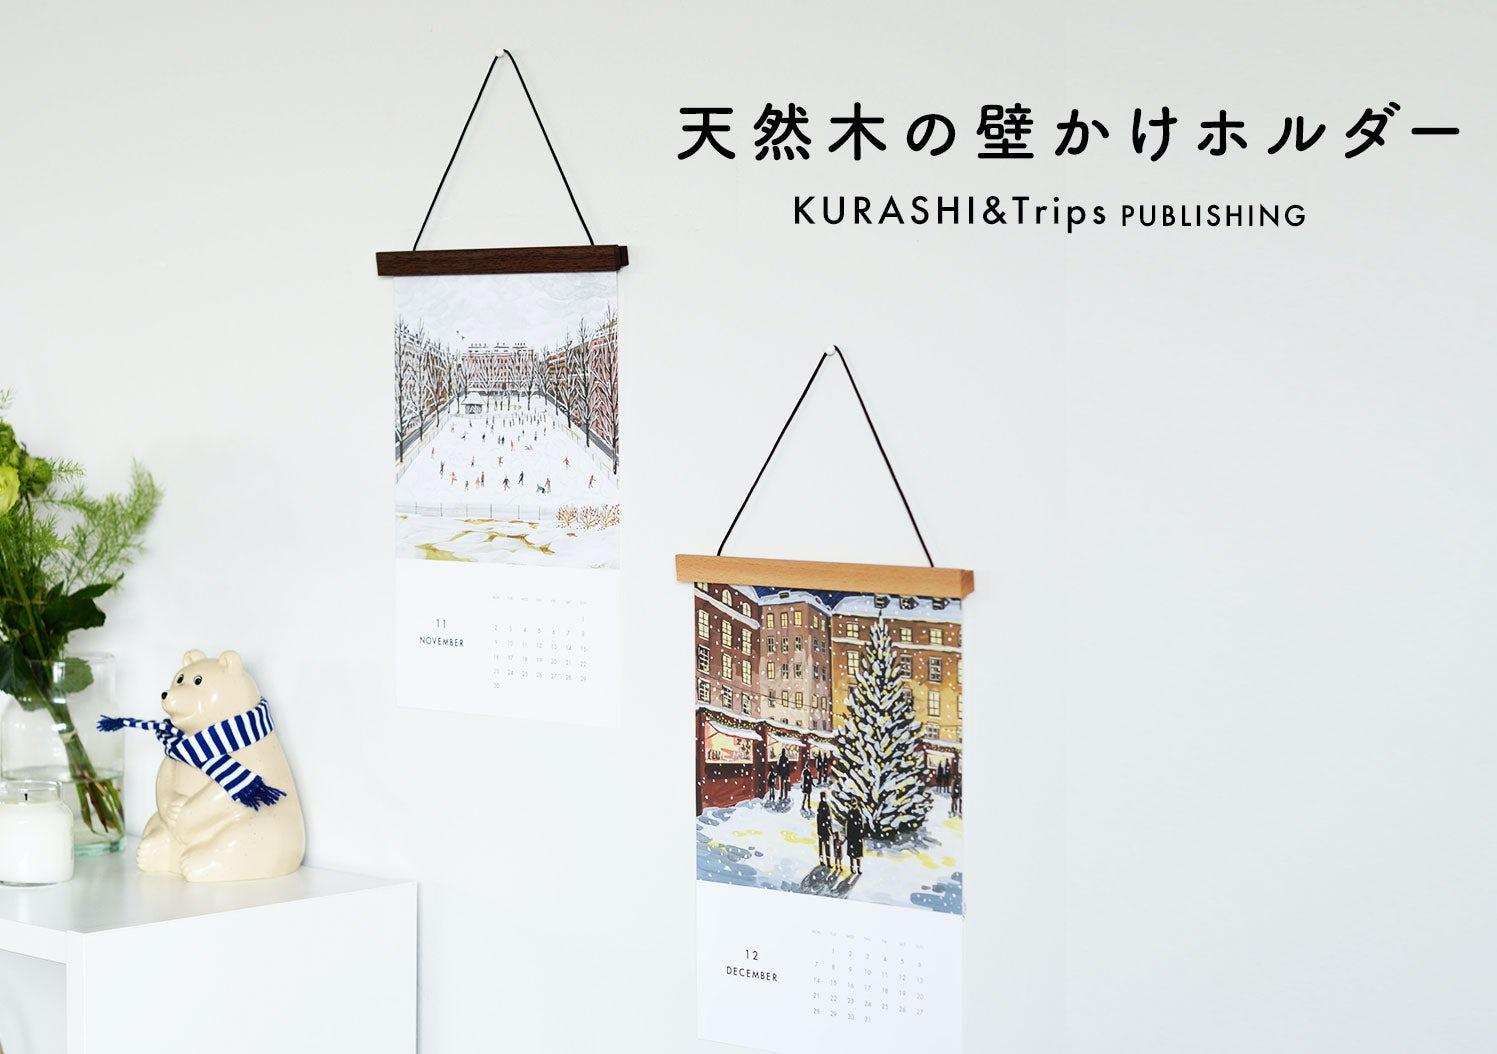 KURASHI&Trips PUBLISHING / 天然木の壁かけホルダーの画像